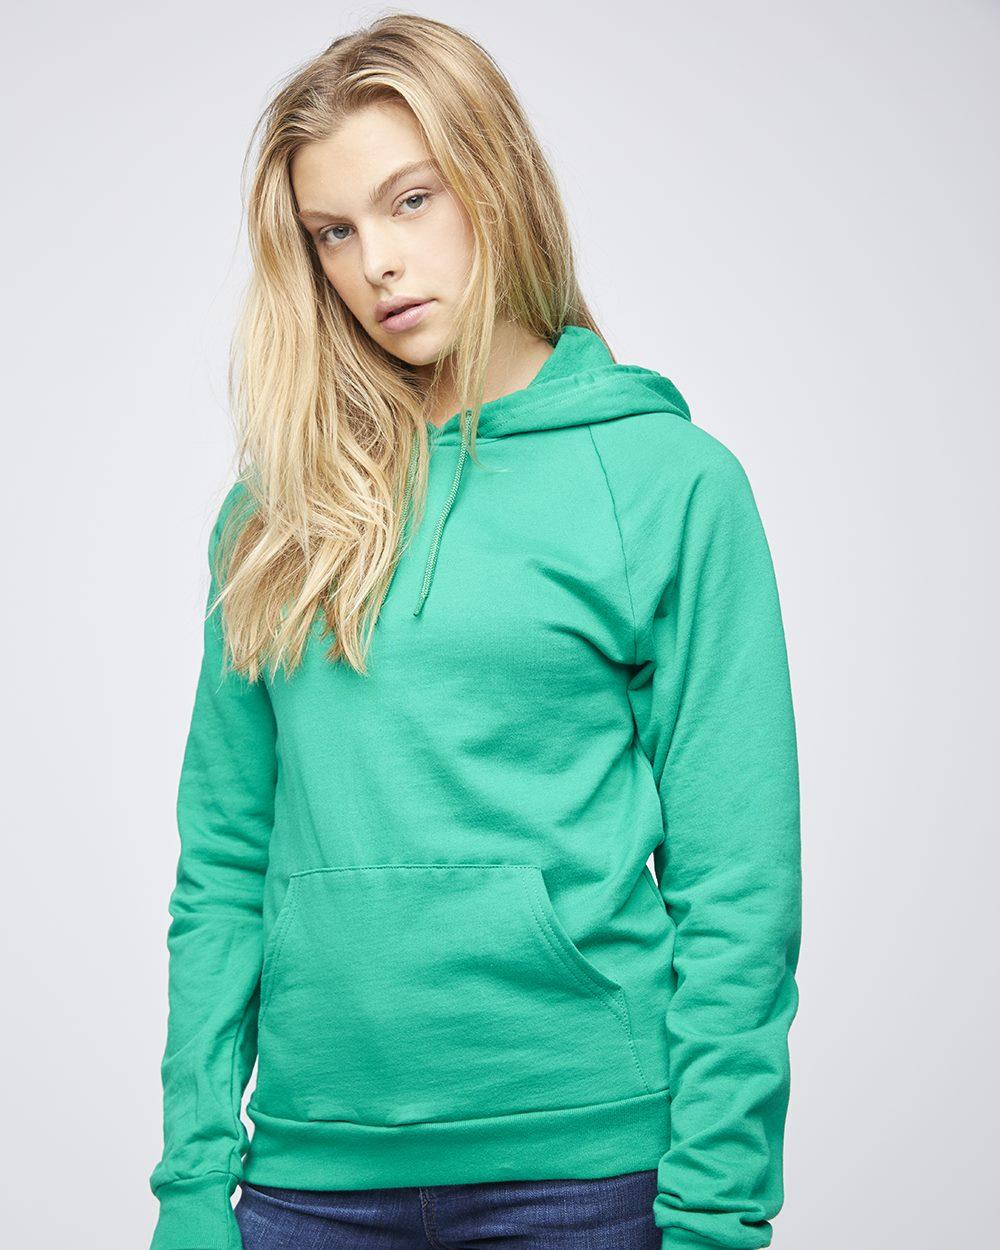 American Apparel 5495W - Cali Fleece Pullover Hoodie